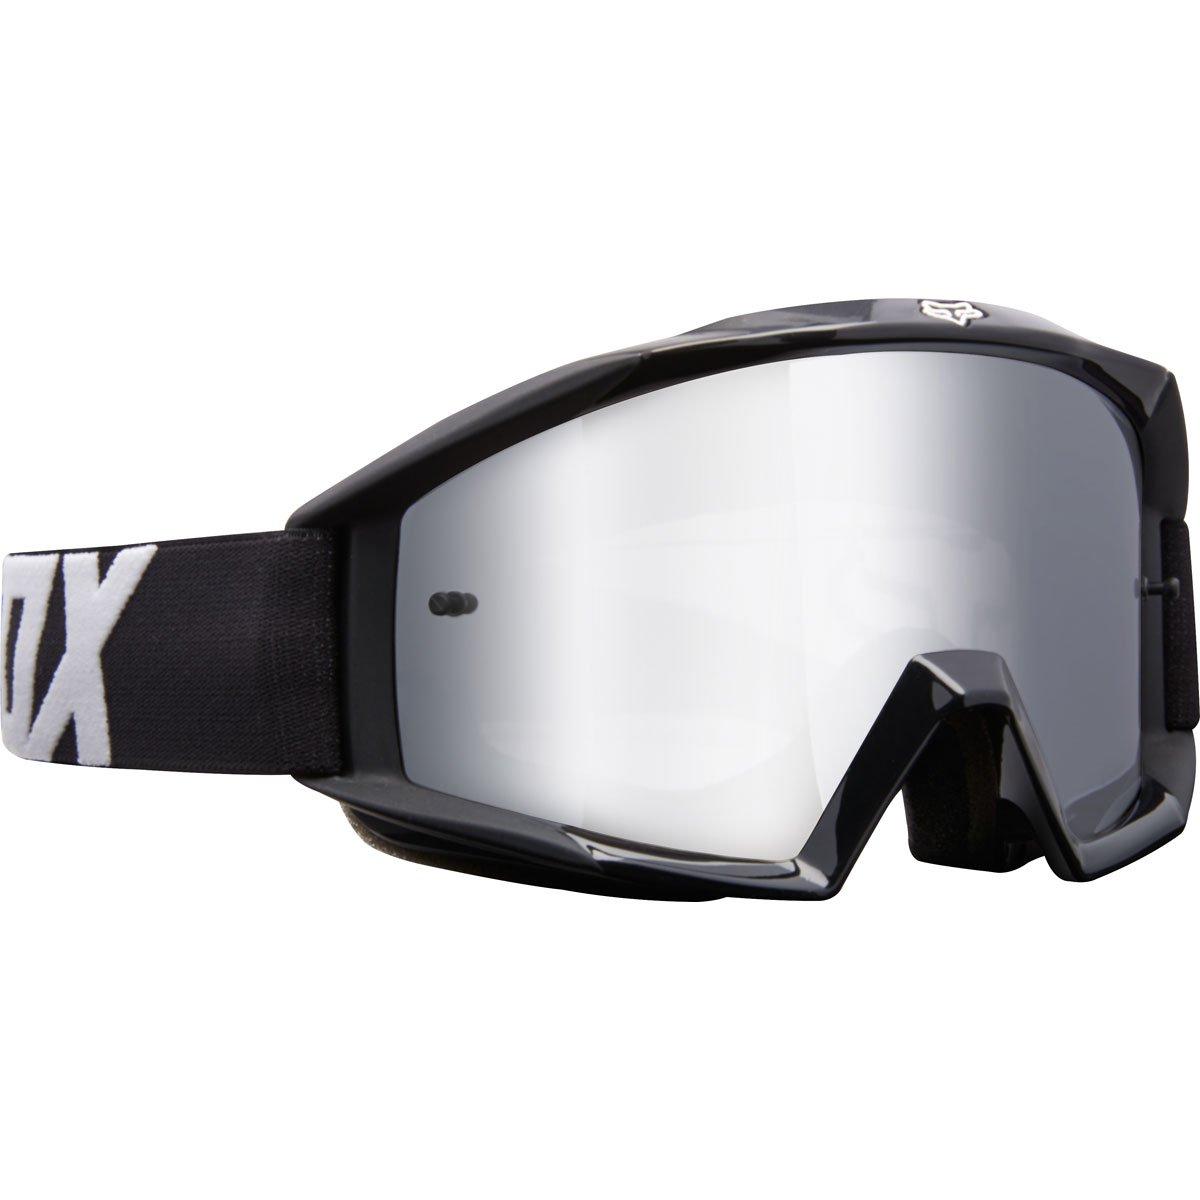 Fox Racing Main Youth Race Youth MX Motorcycle Goggles Eyewear - Black / No Size